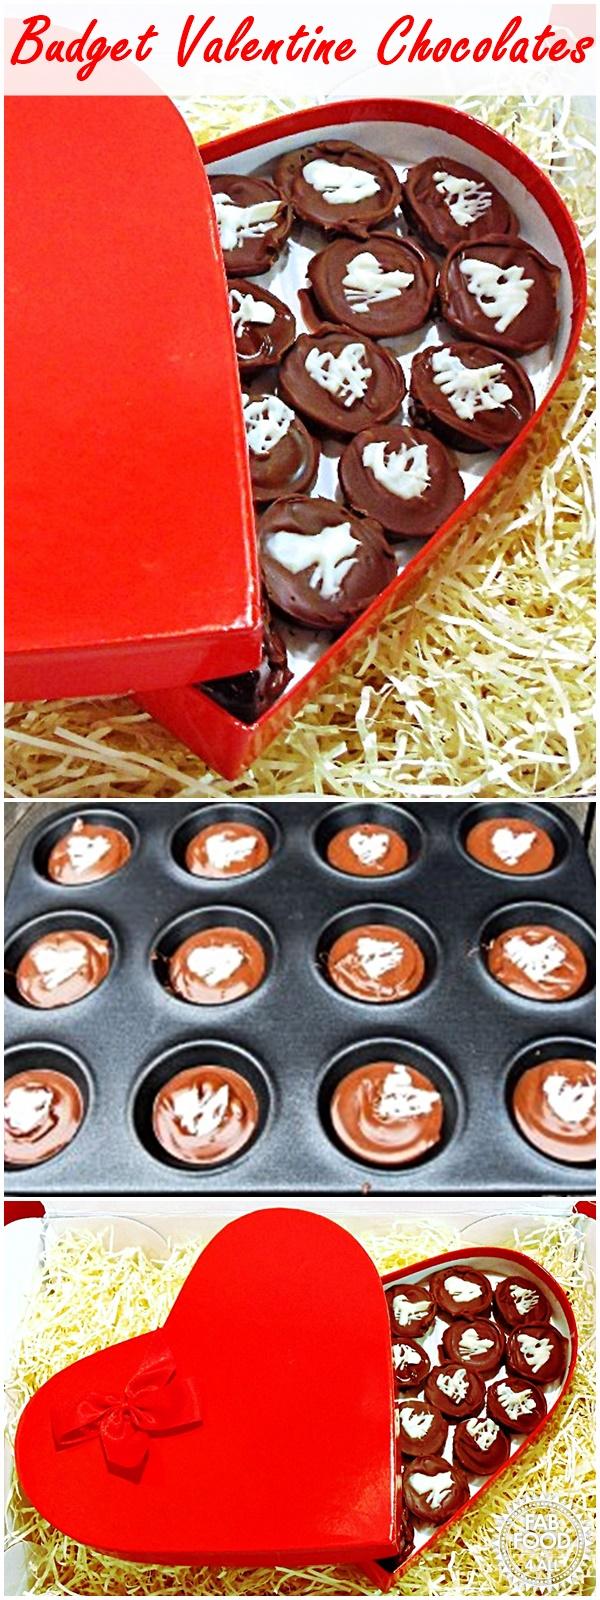 Budget Valentine Chocolates - Fab Food 4 All